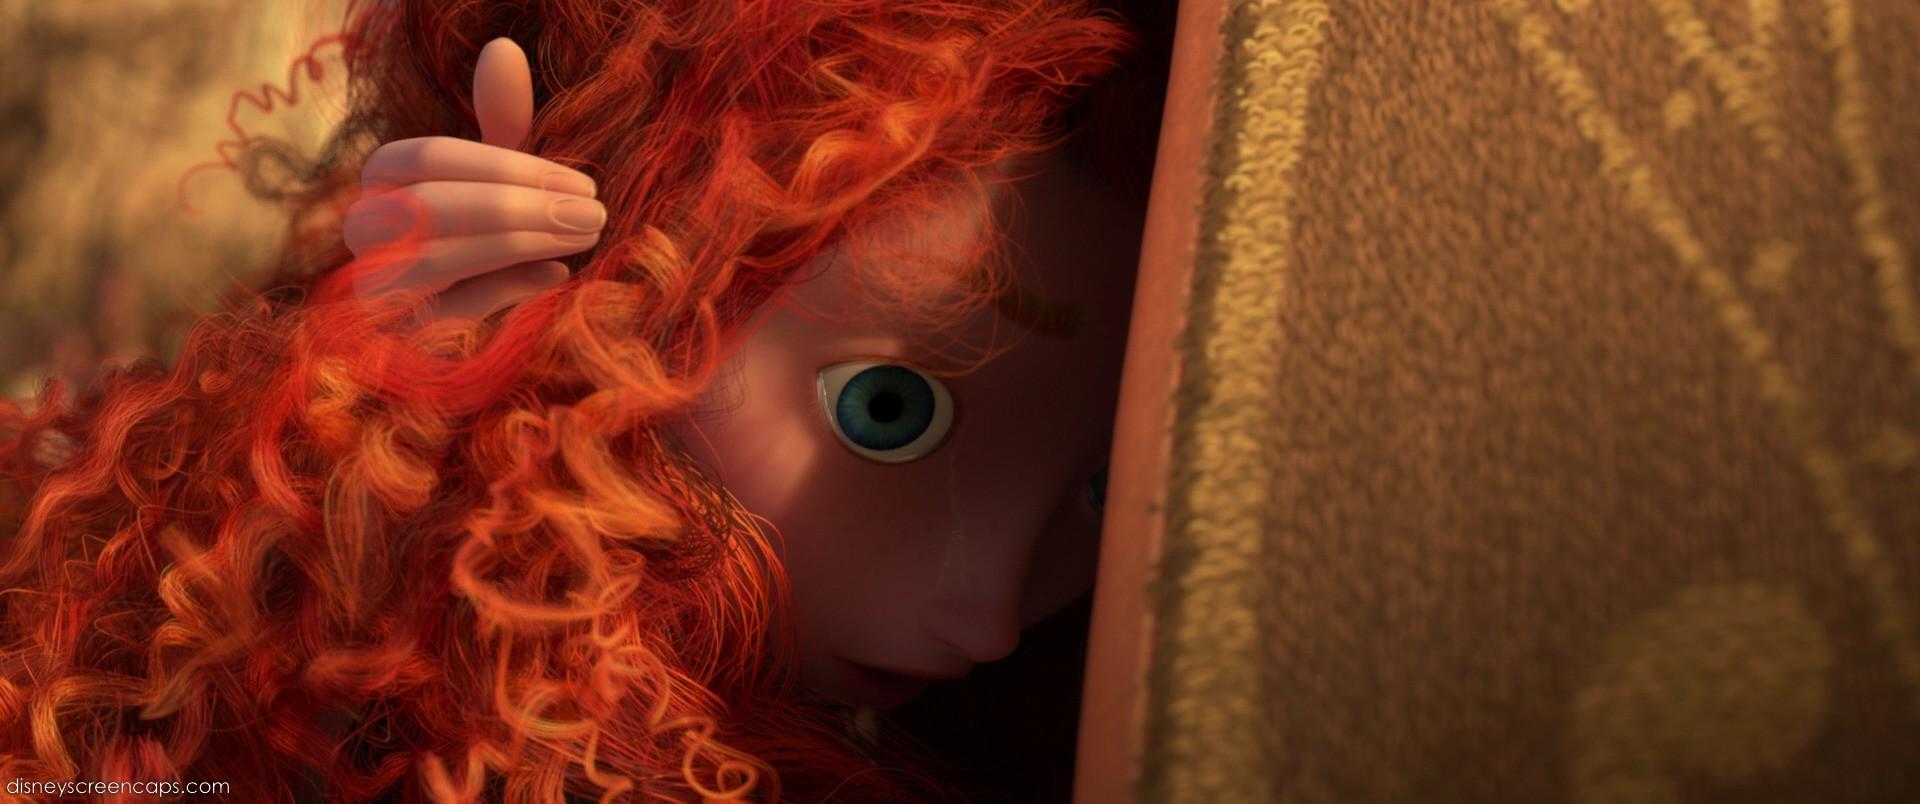 Disney Screencaps - Merida.